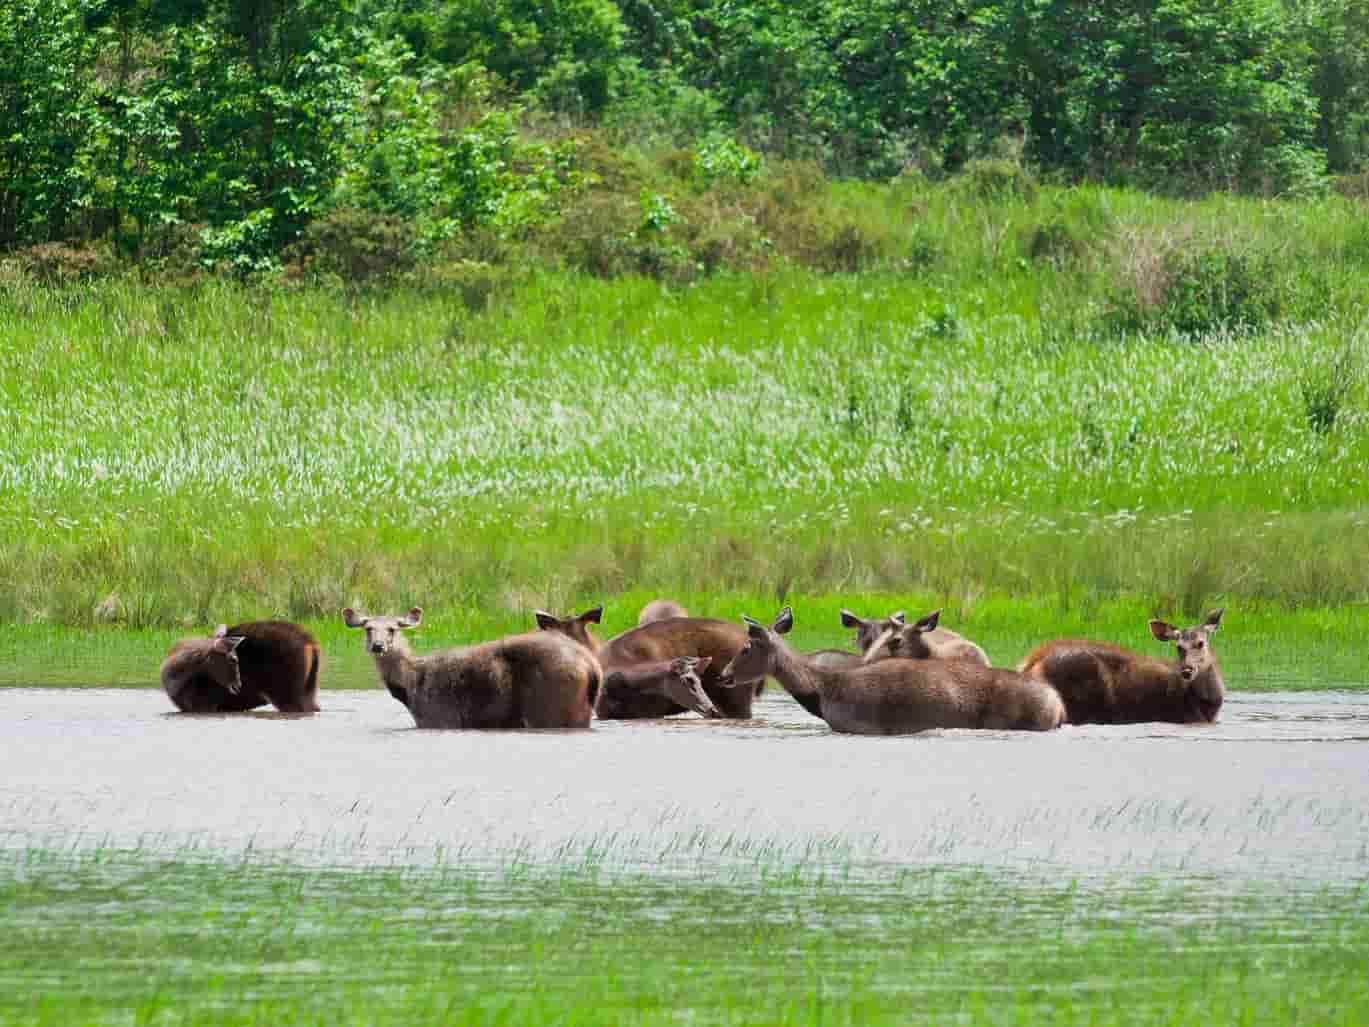 Sunarban National Park, Kolkata, India